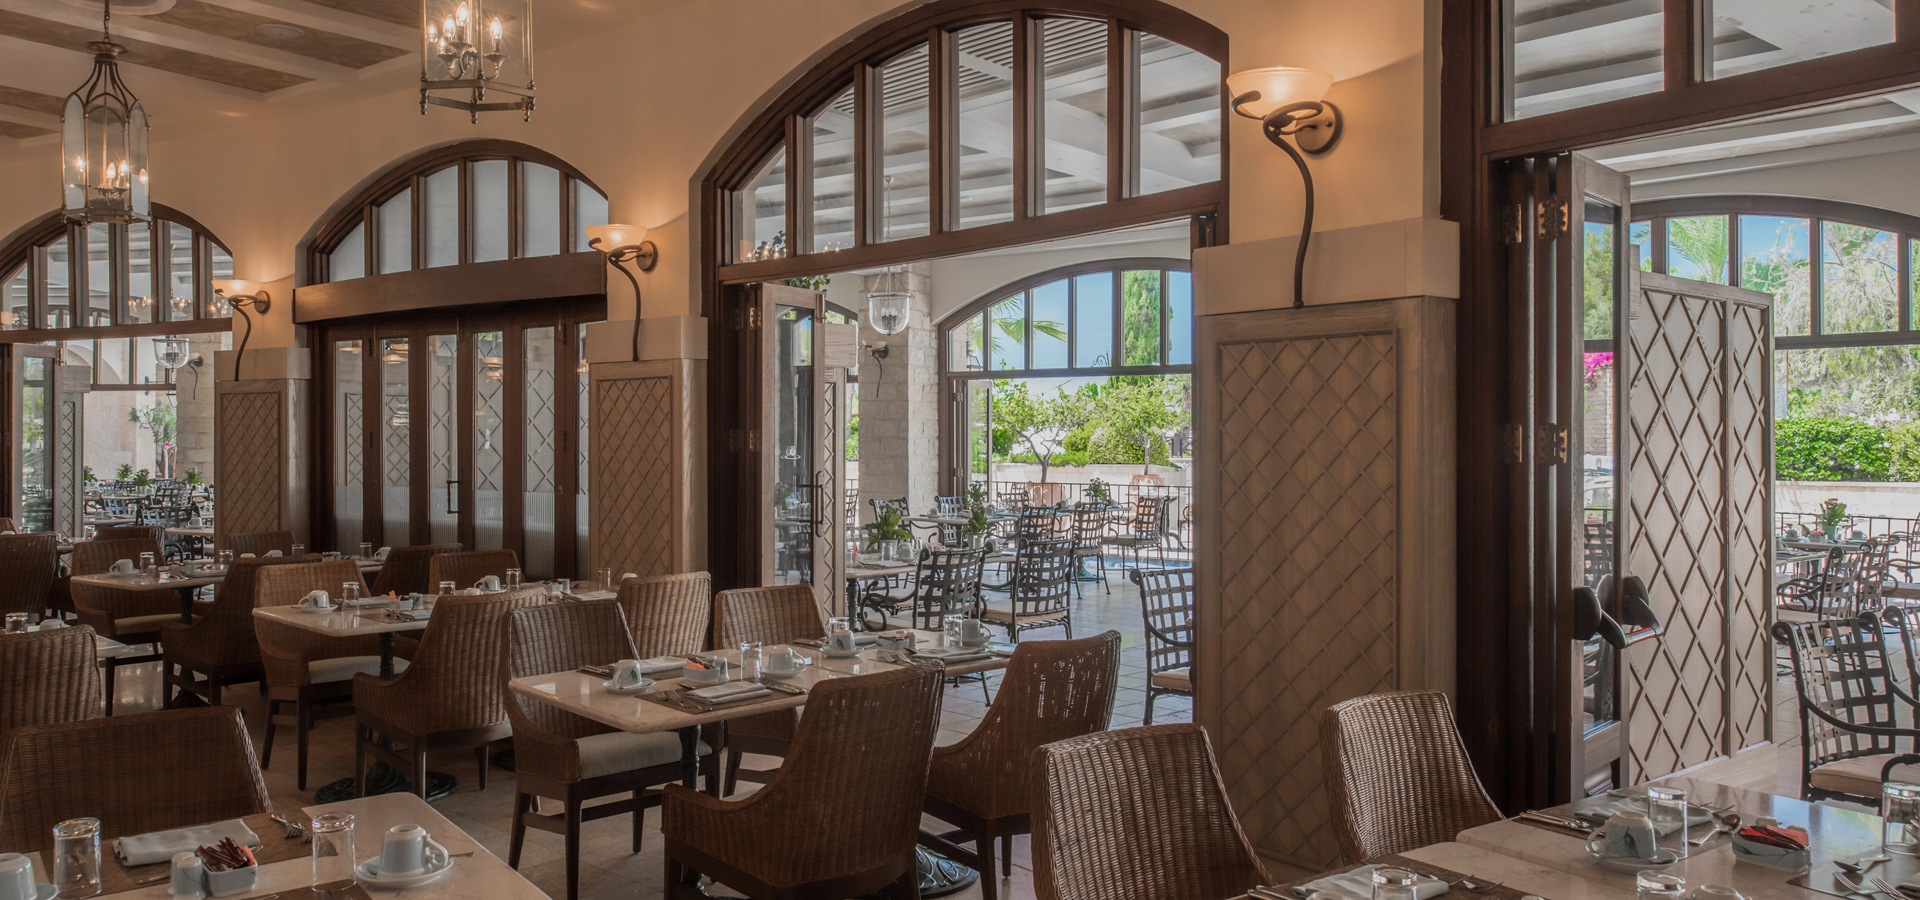 Lemonia Piazza Restaurant Cyprus Family Dining Paphos